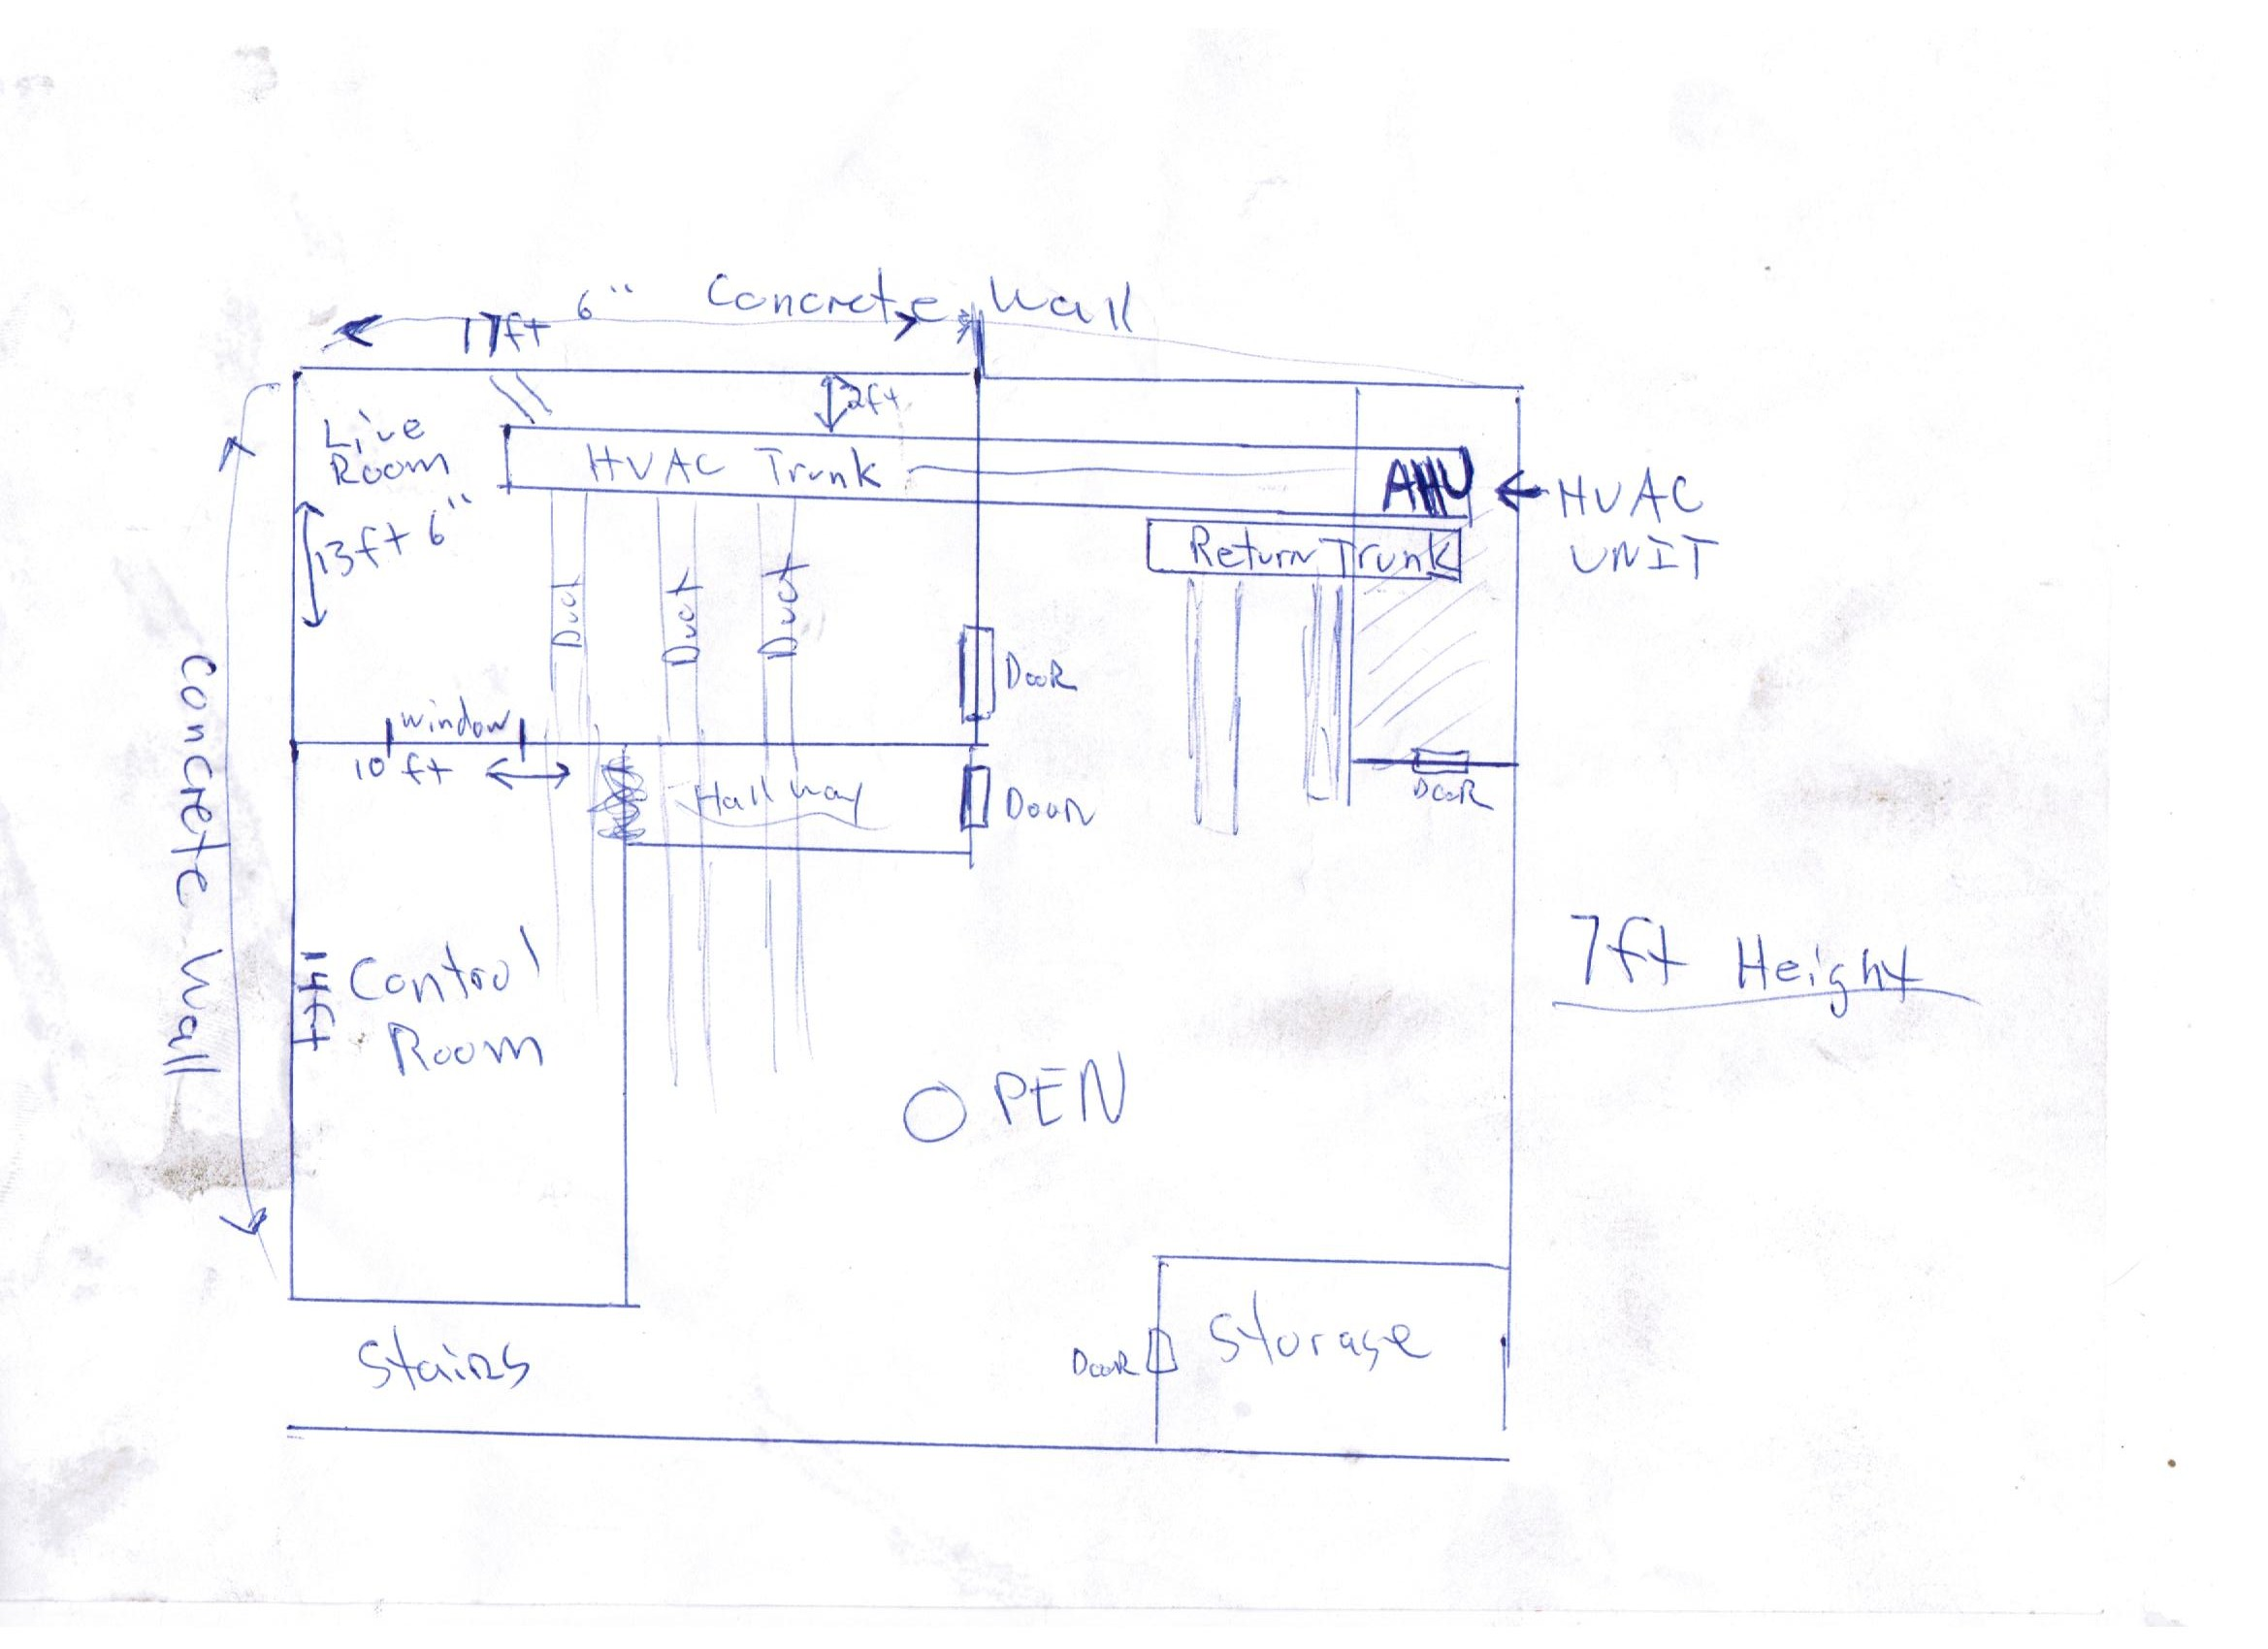 Hvac Advisetipshelp Gearslutz Drawing Of 2996851630053704236vljasm Ph